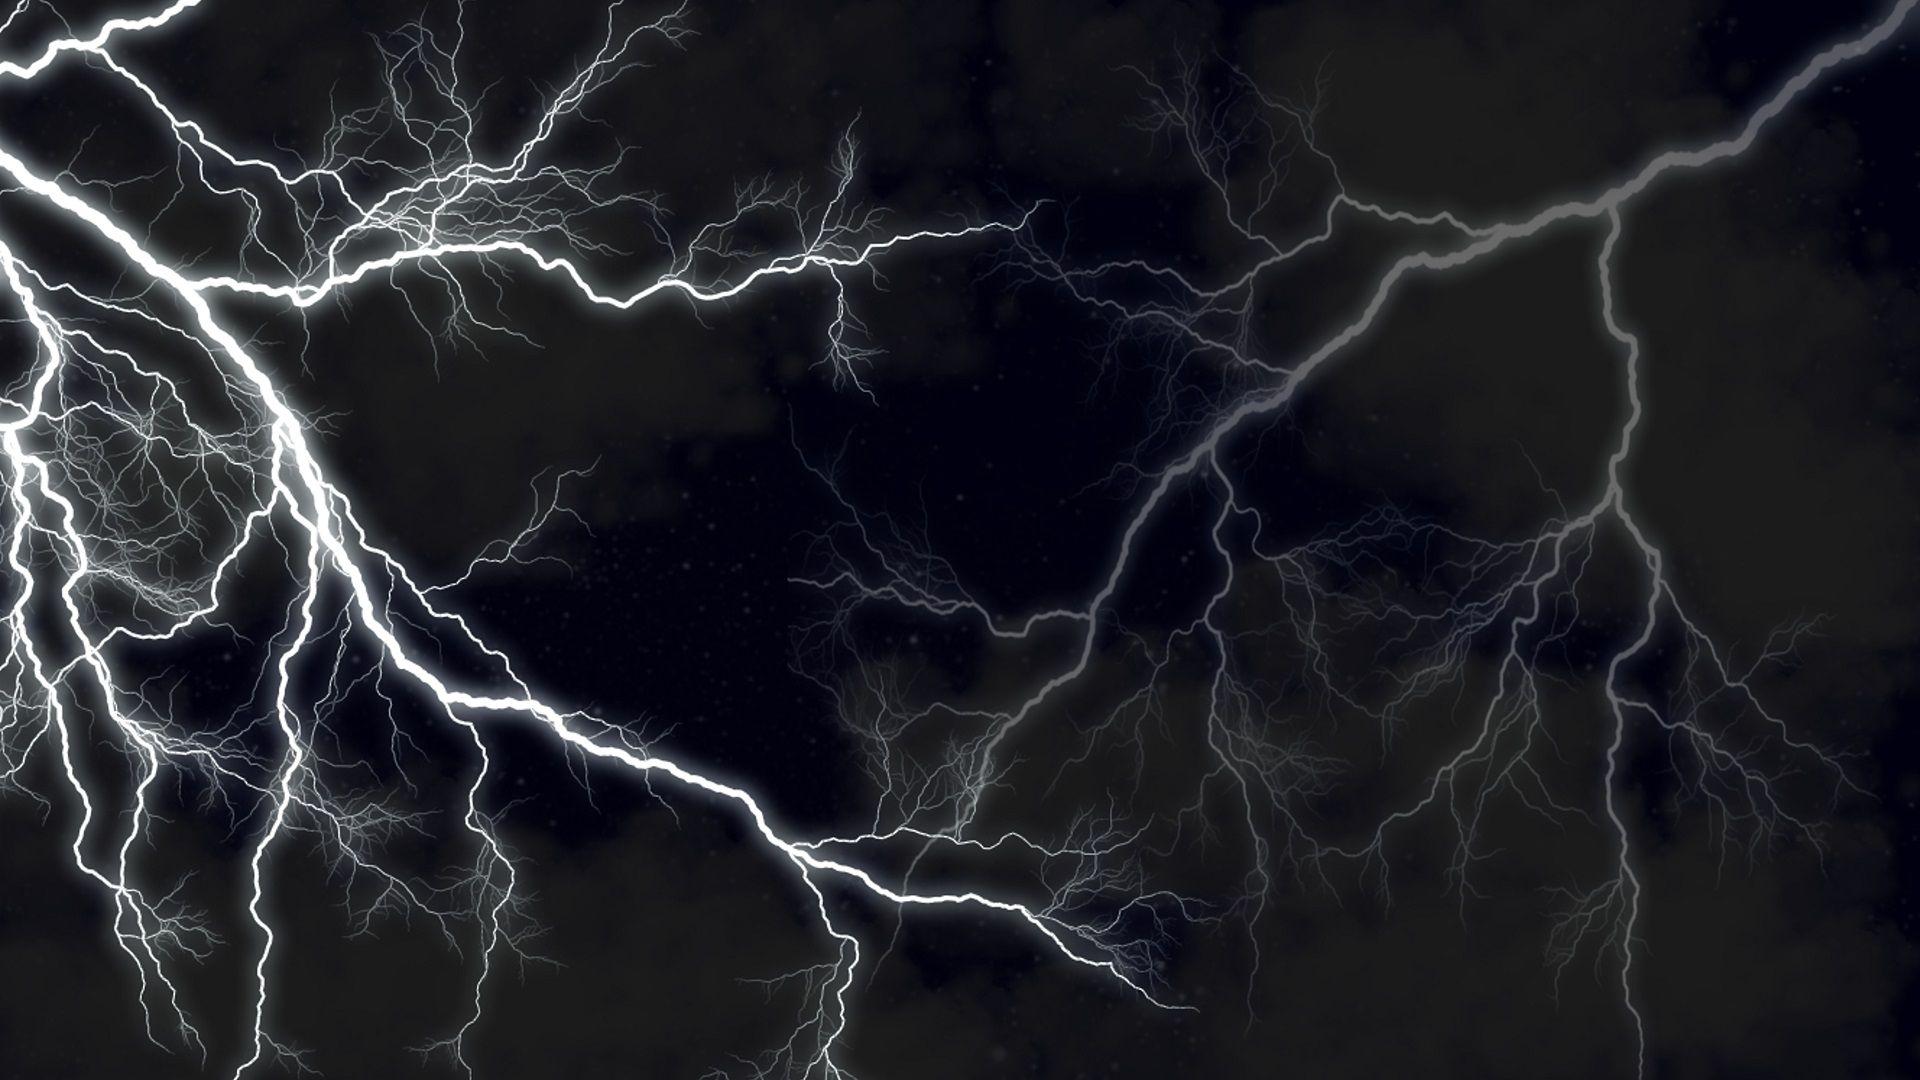 Hd Lightning Wallpapers 1920 1080 Lightning Backgrounds 52 Wallpapers Adorable Wallpapers Hintergrundbilder Hd Hintergrundbilder Bilder